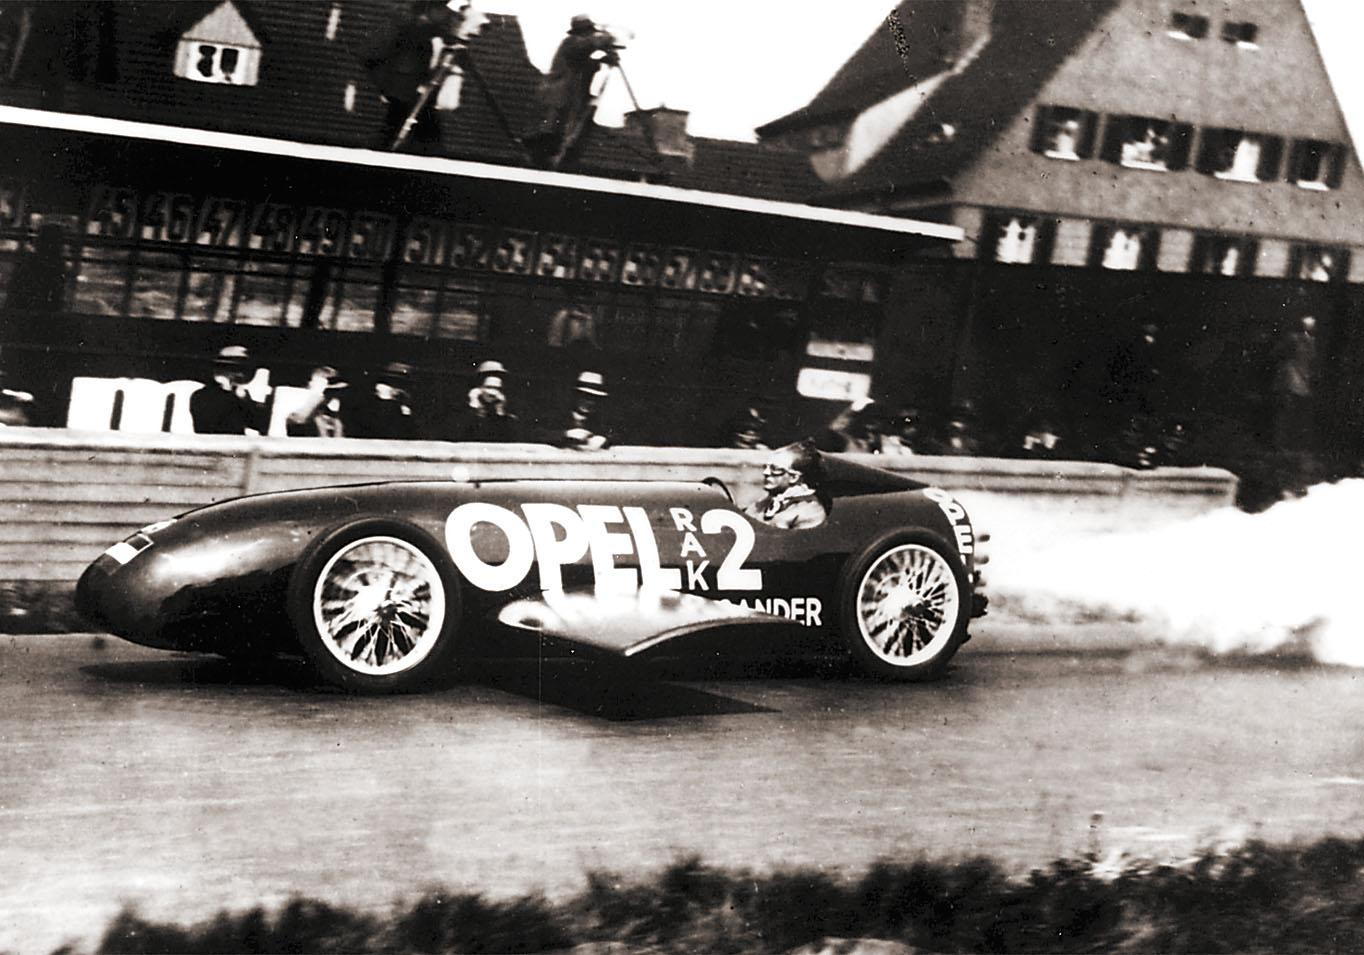 Mobilisti_Opel_Raketti105